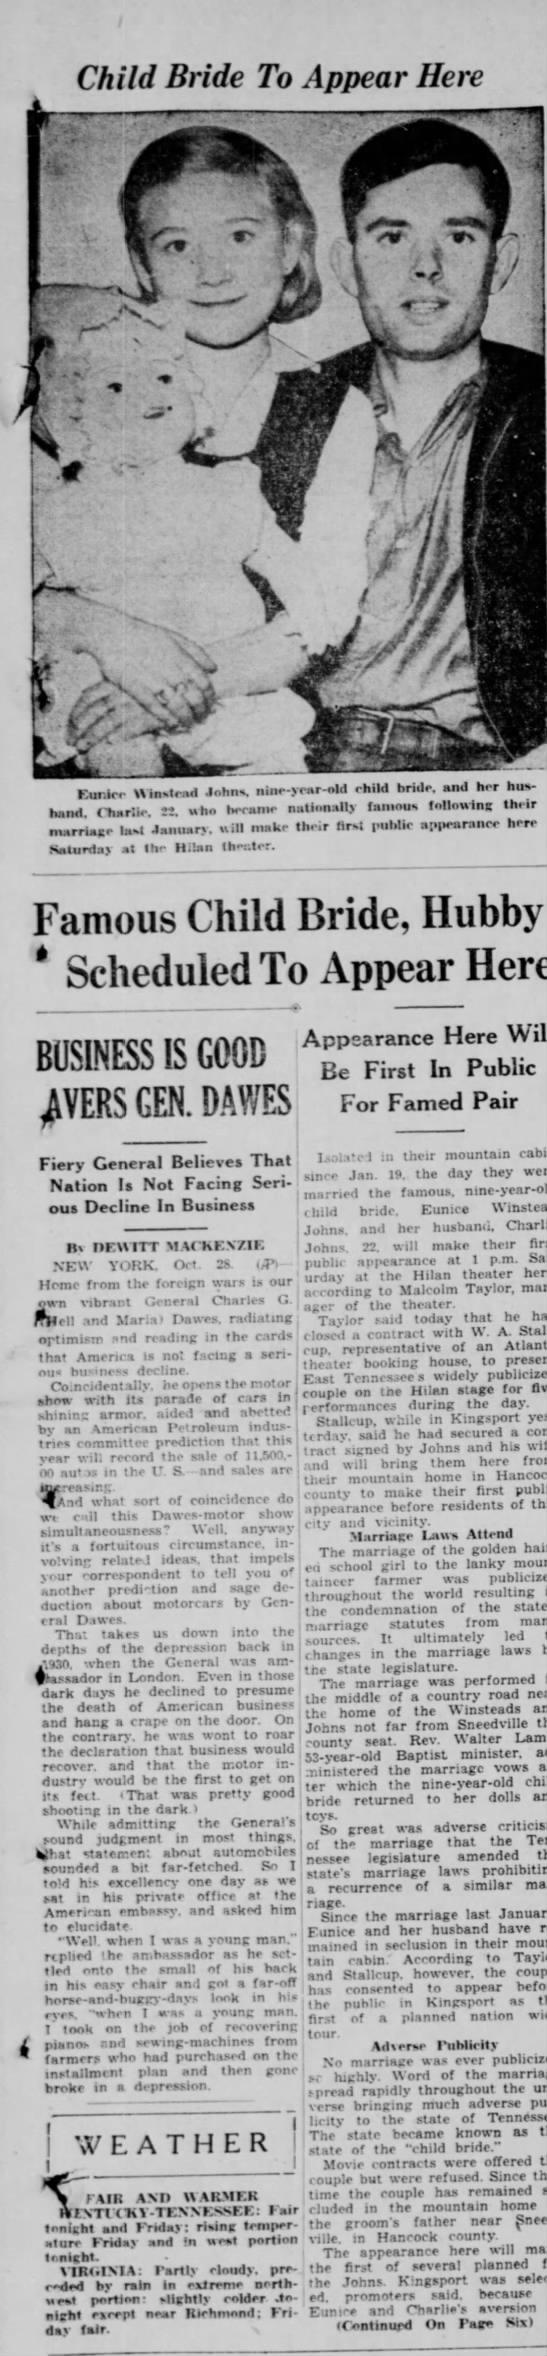 Child Bride-Hancock County Tenn. Eunice Winstead, age 9  married to Charlie Johns age 22. -